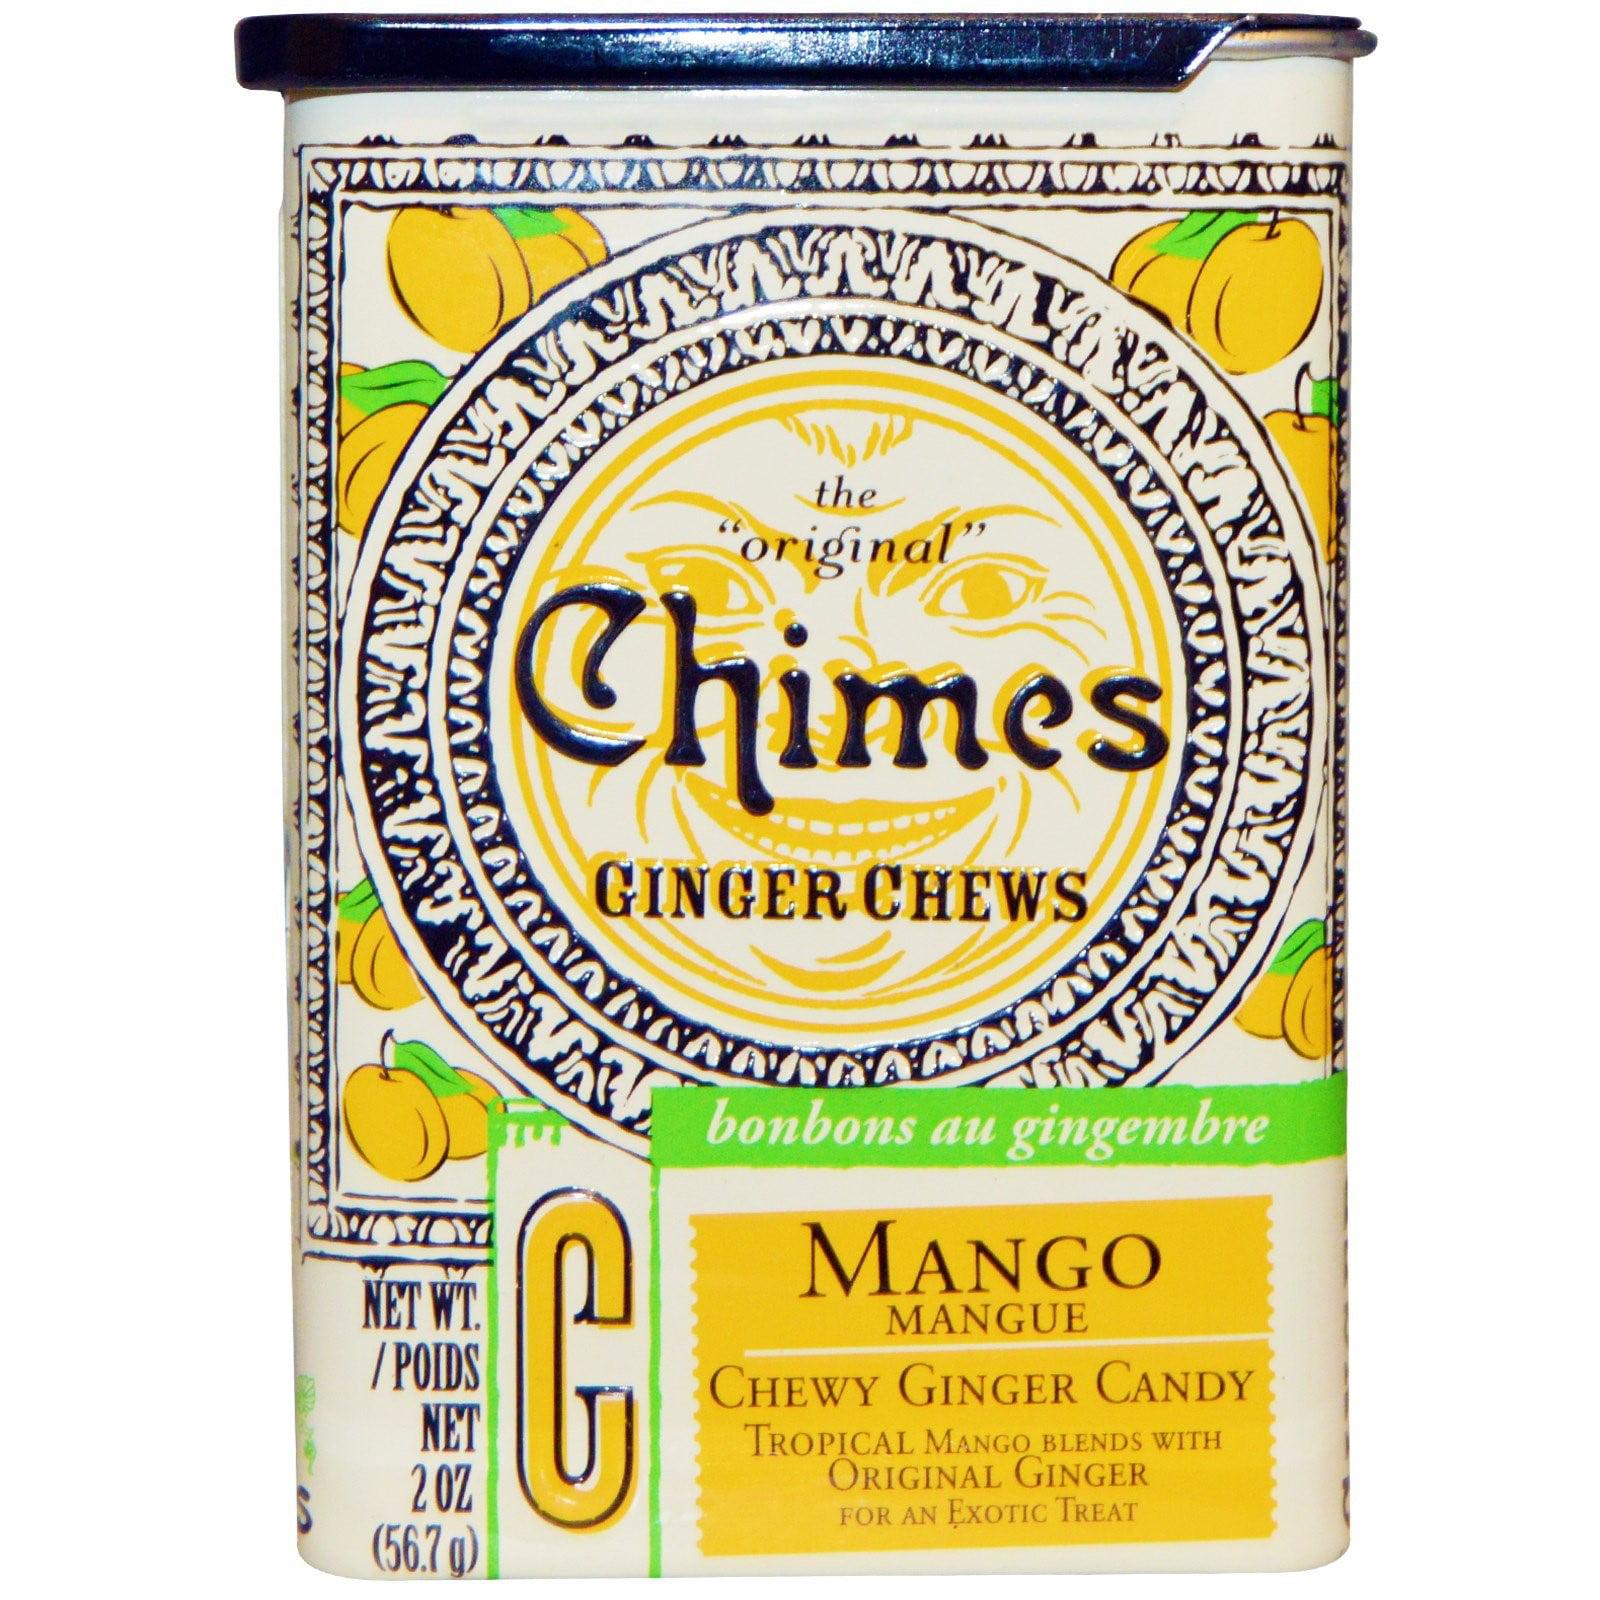 Chimes, Ginger Chews, Mango, 2 oz(pack of 4)